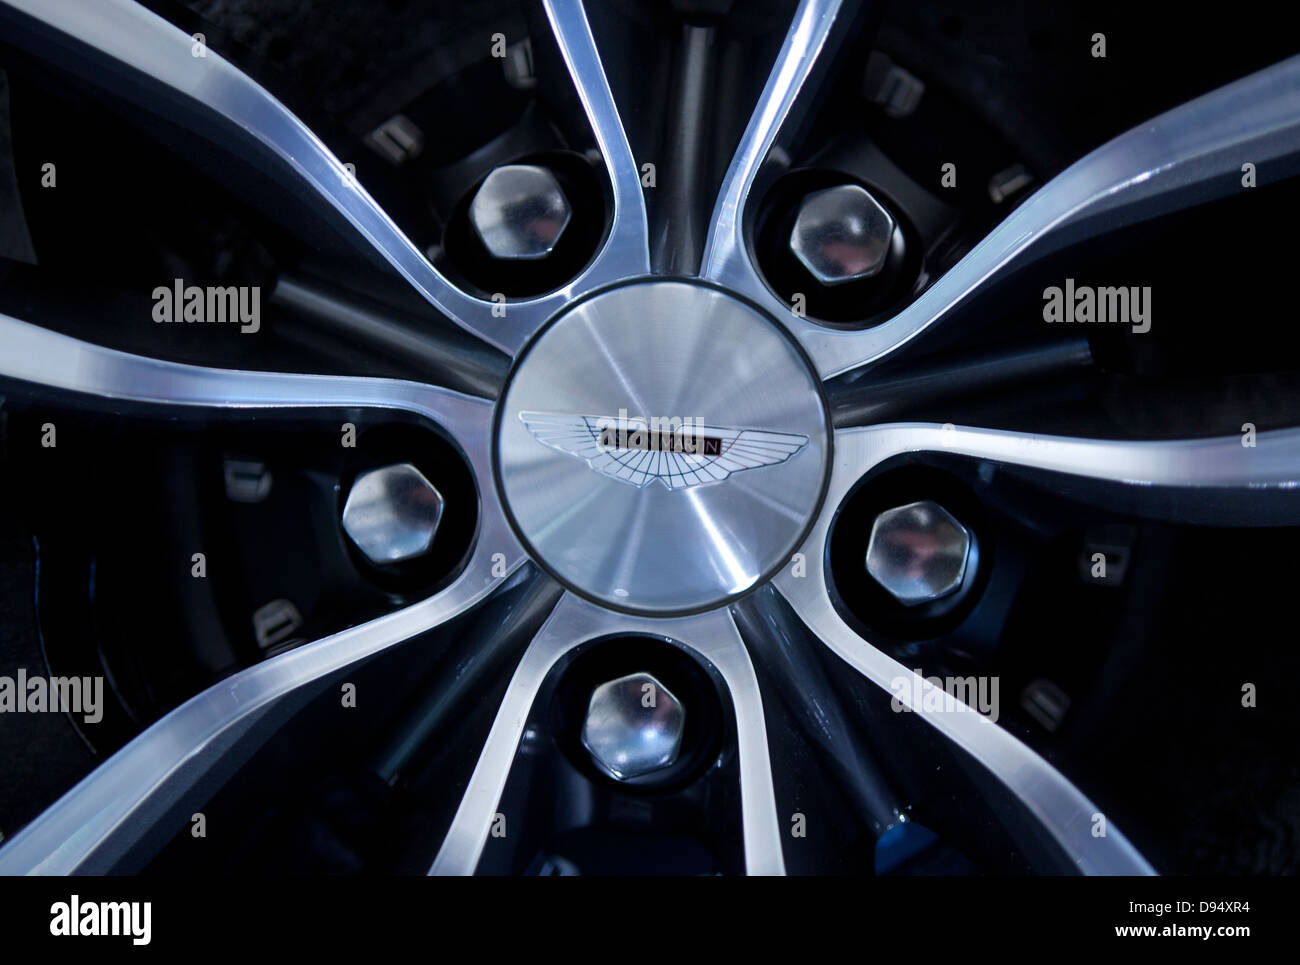 Aston Martin wheel hub - Stock Image